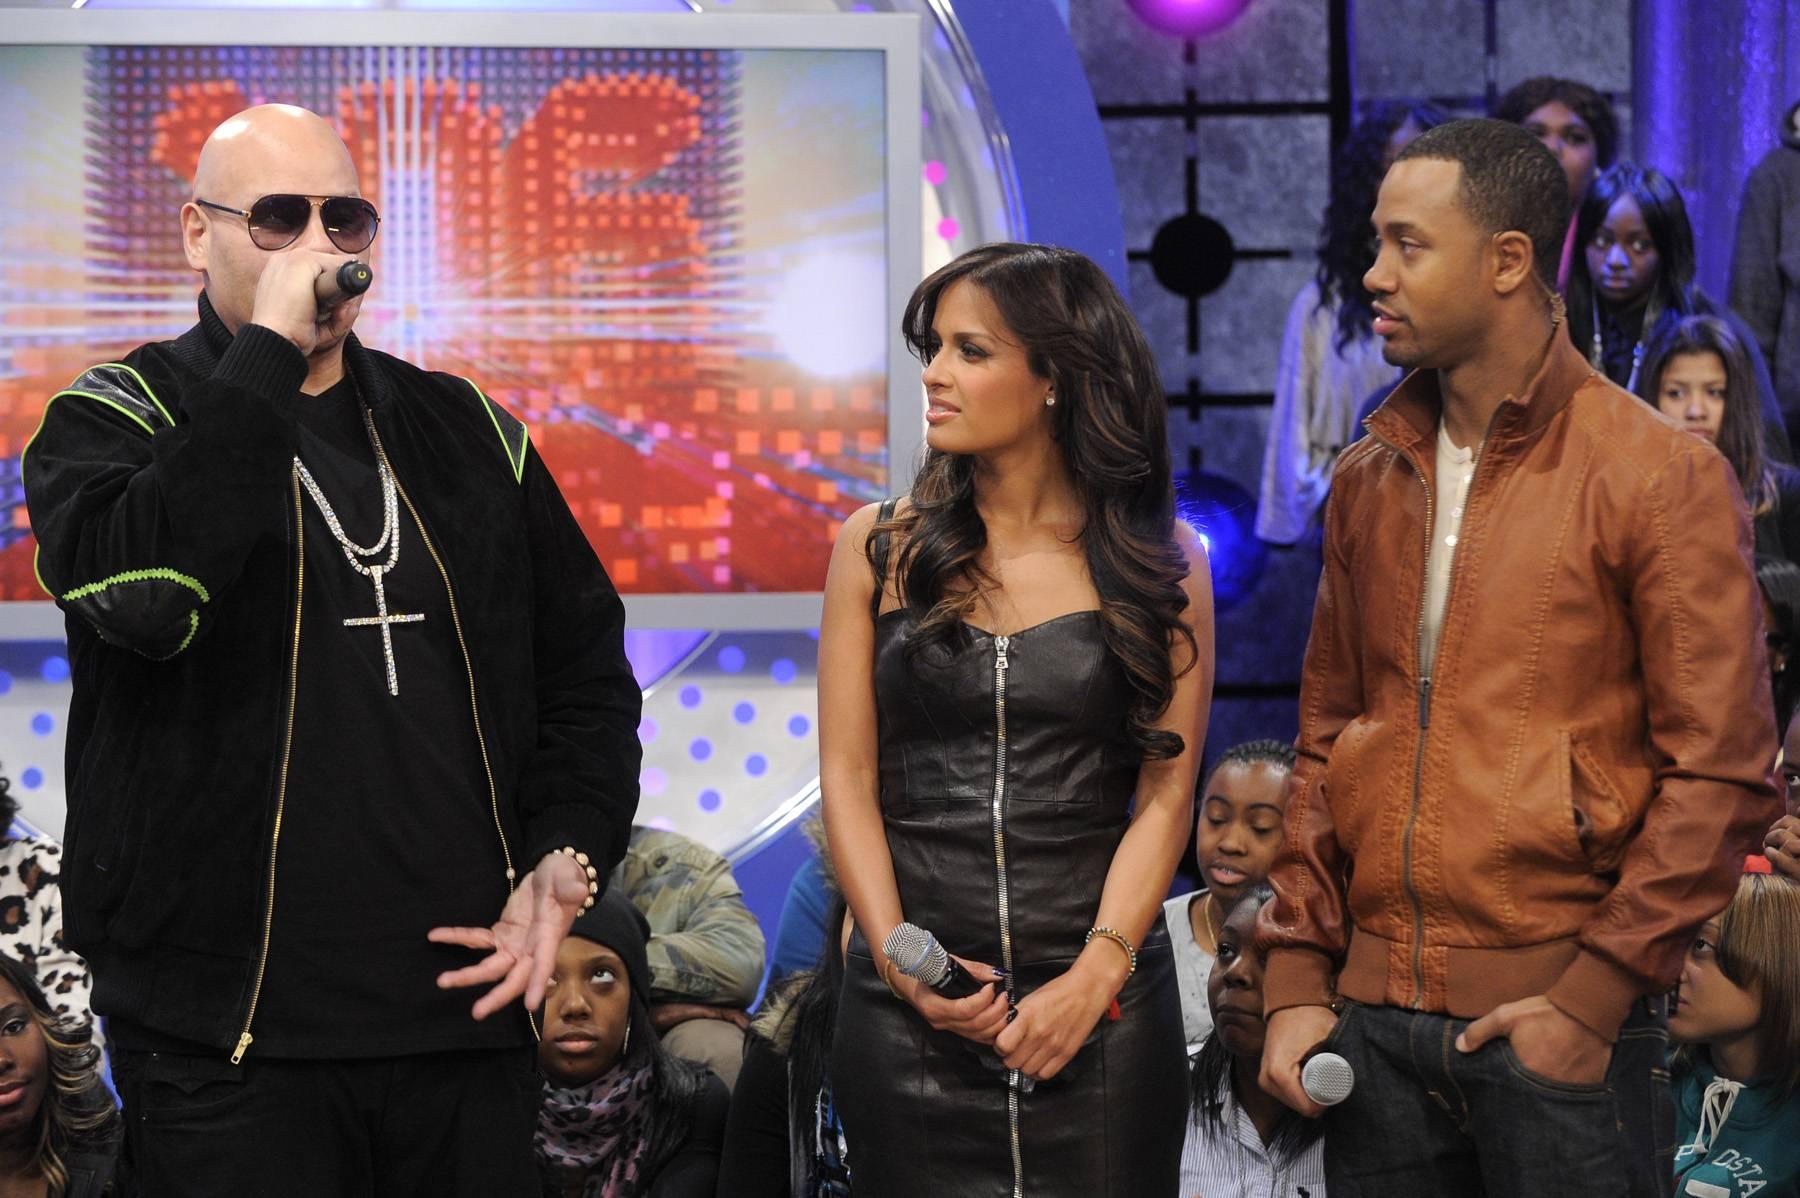 Love the Game - Fat Joe with Rocsi Diaz and Terrence J at 106 & Park, January 3, 2012. (Photo: John Ricard / BET)